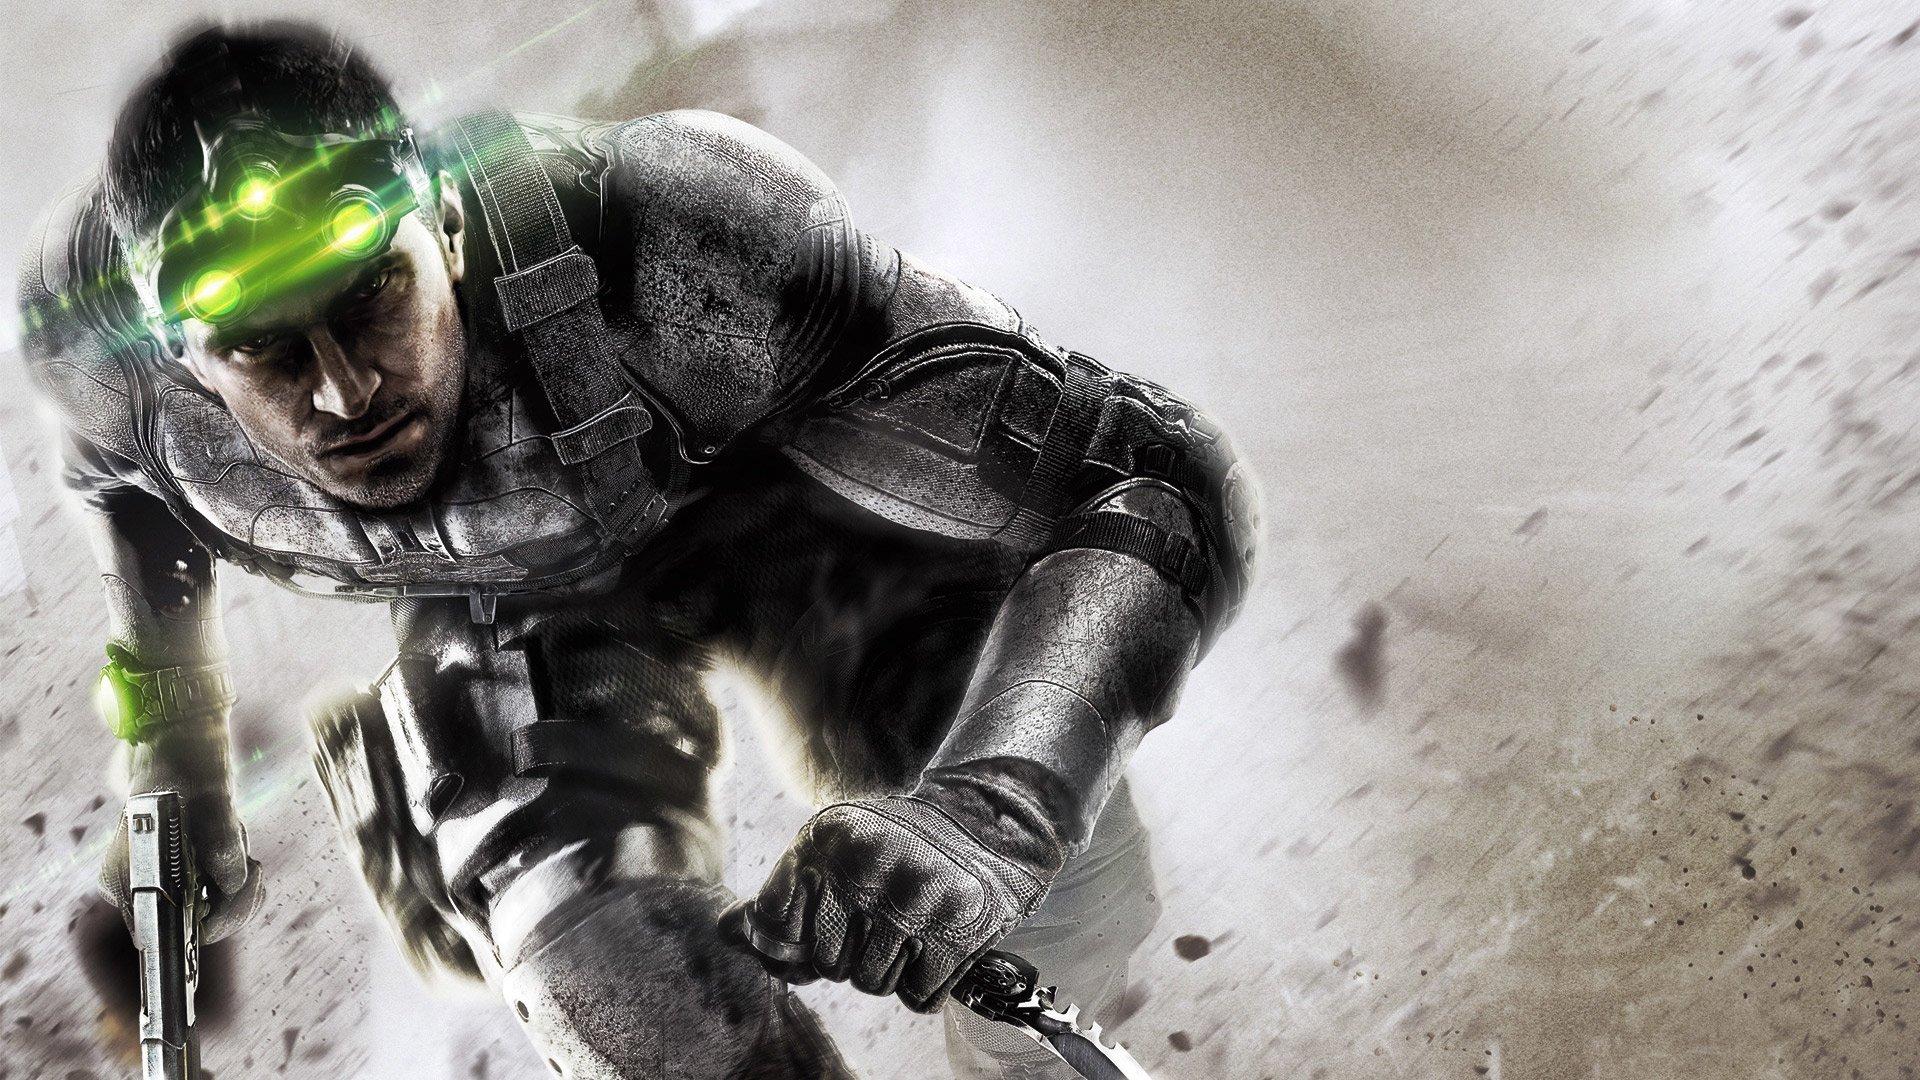 Слухи: на The Game Awards 2018 покажут новую Splinter Cell. Фанаты ликуют